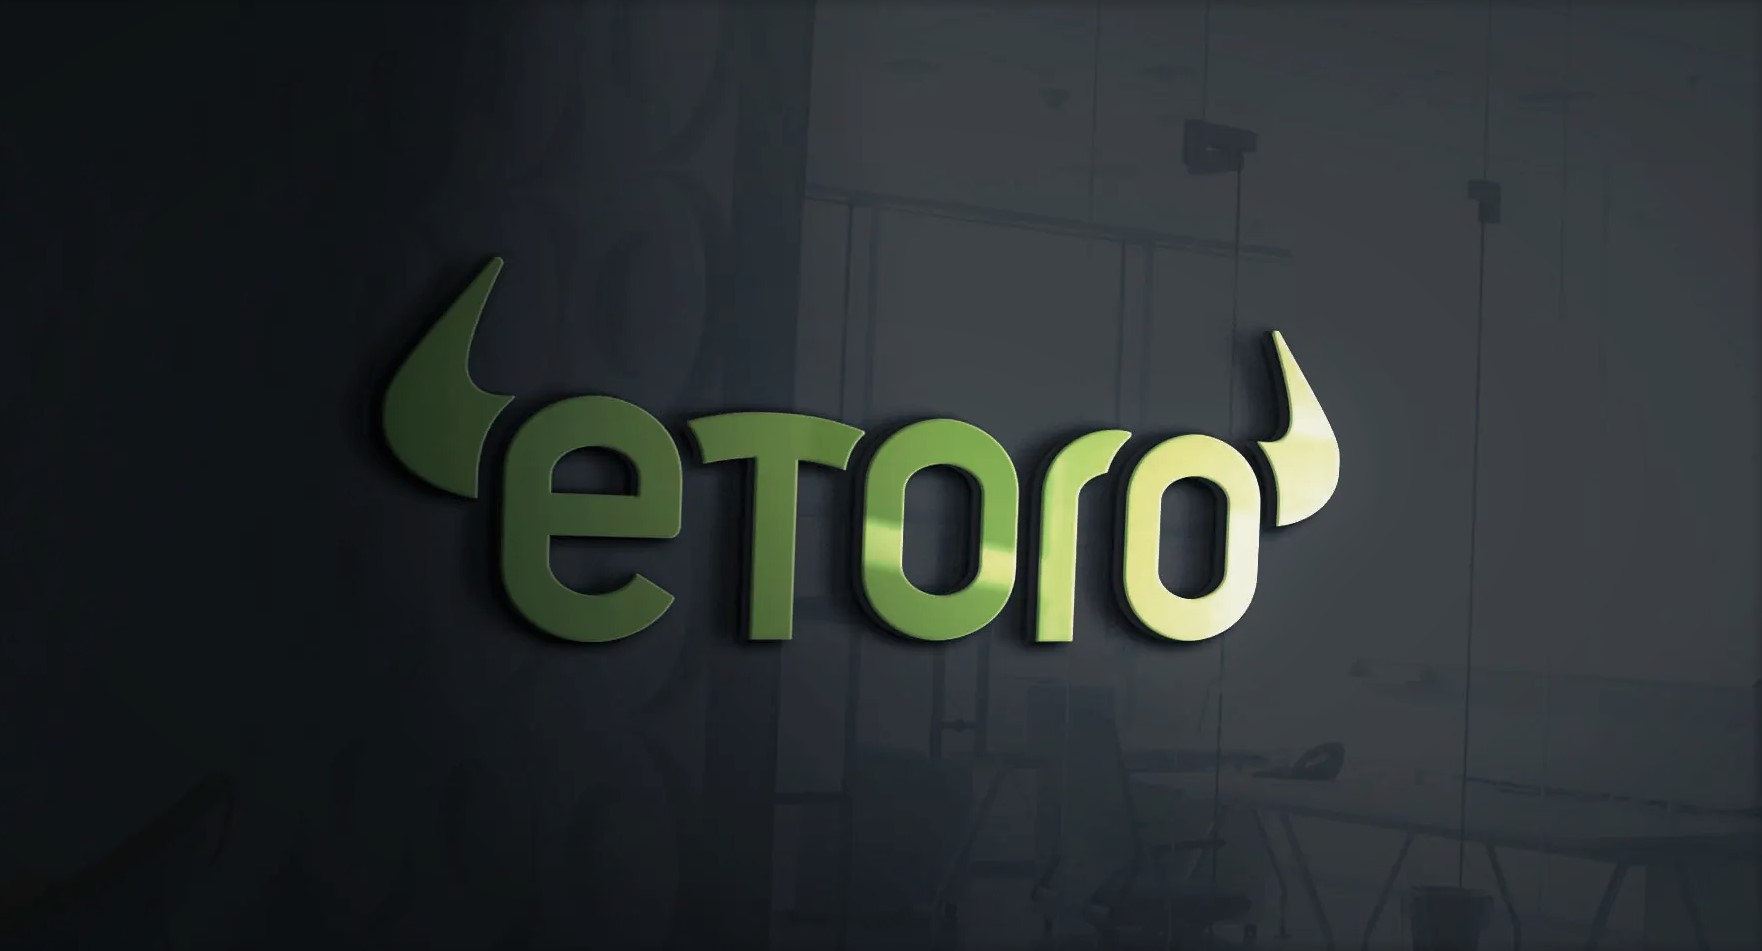 etoro crypto cfd bitcoin platform teszt